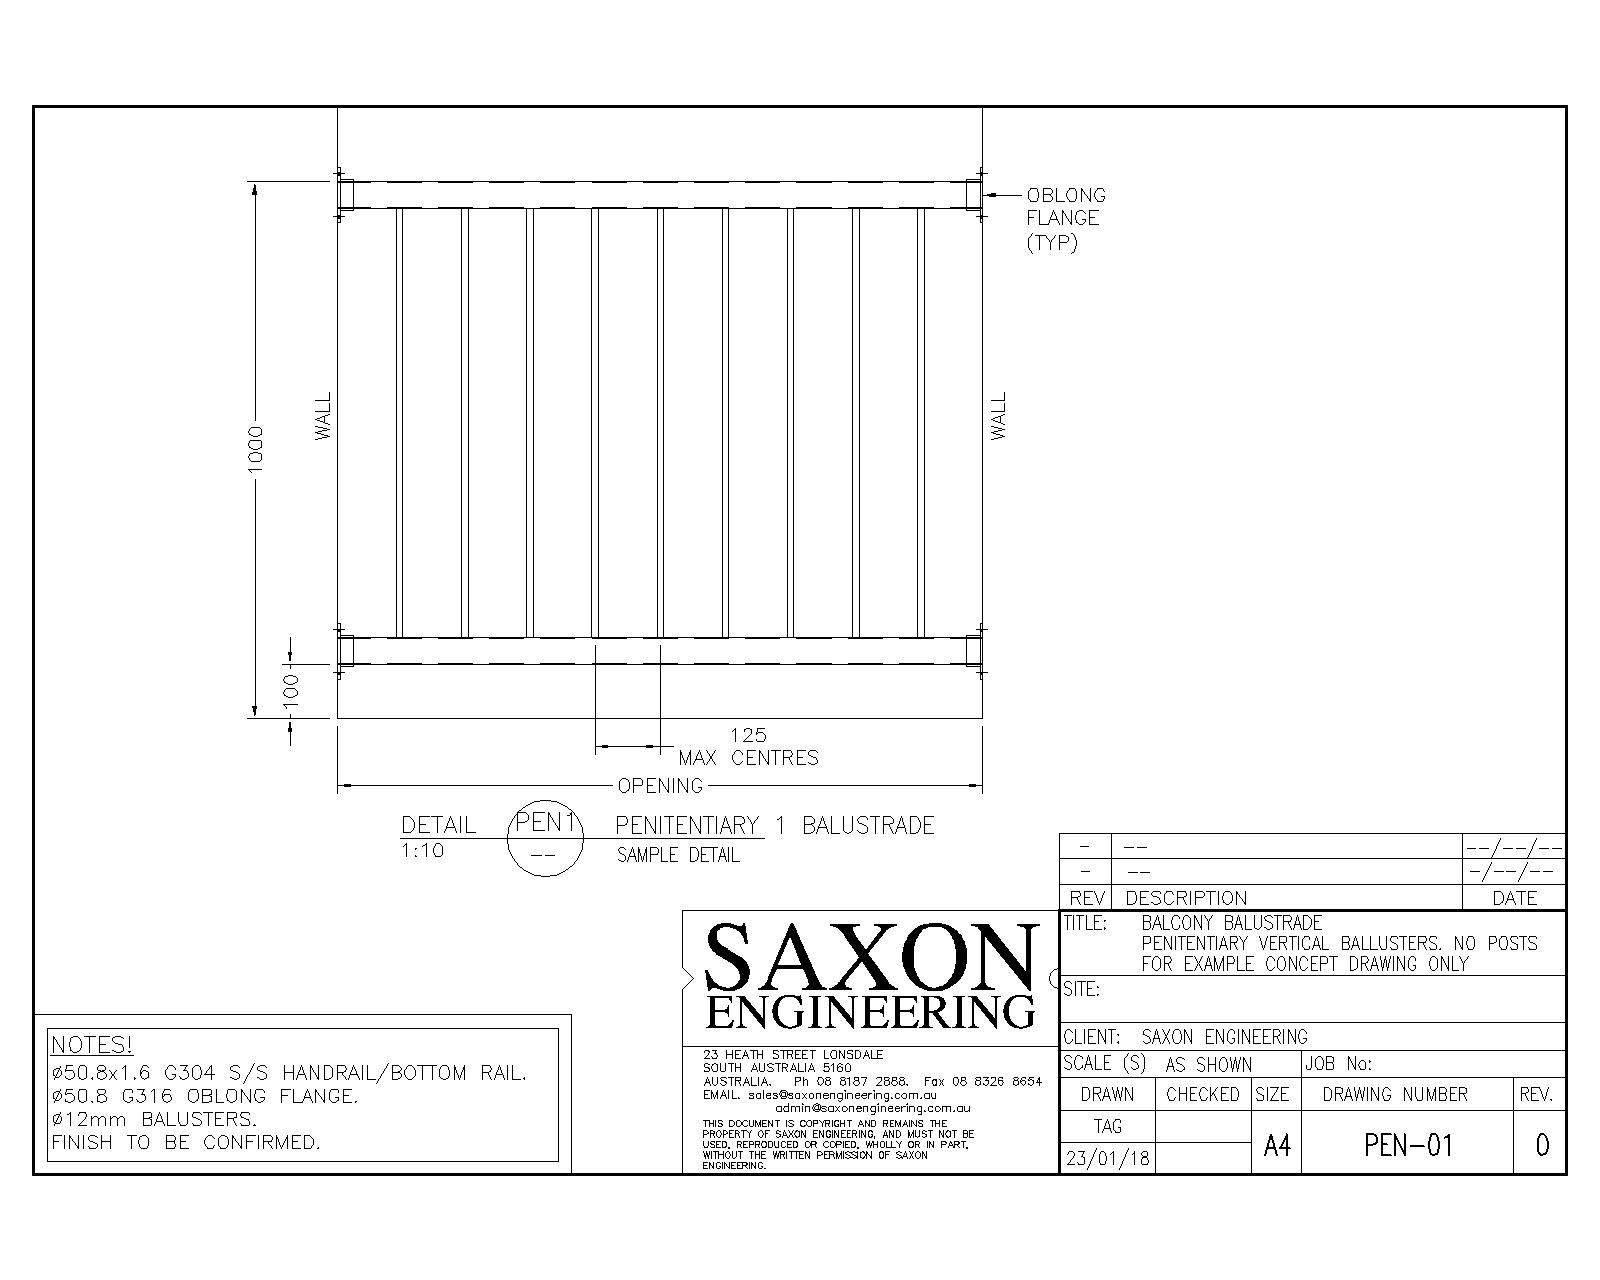 1600x1280 Handrail And Balustrade Drawings Saxon Engineering